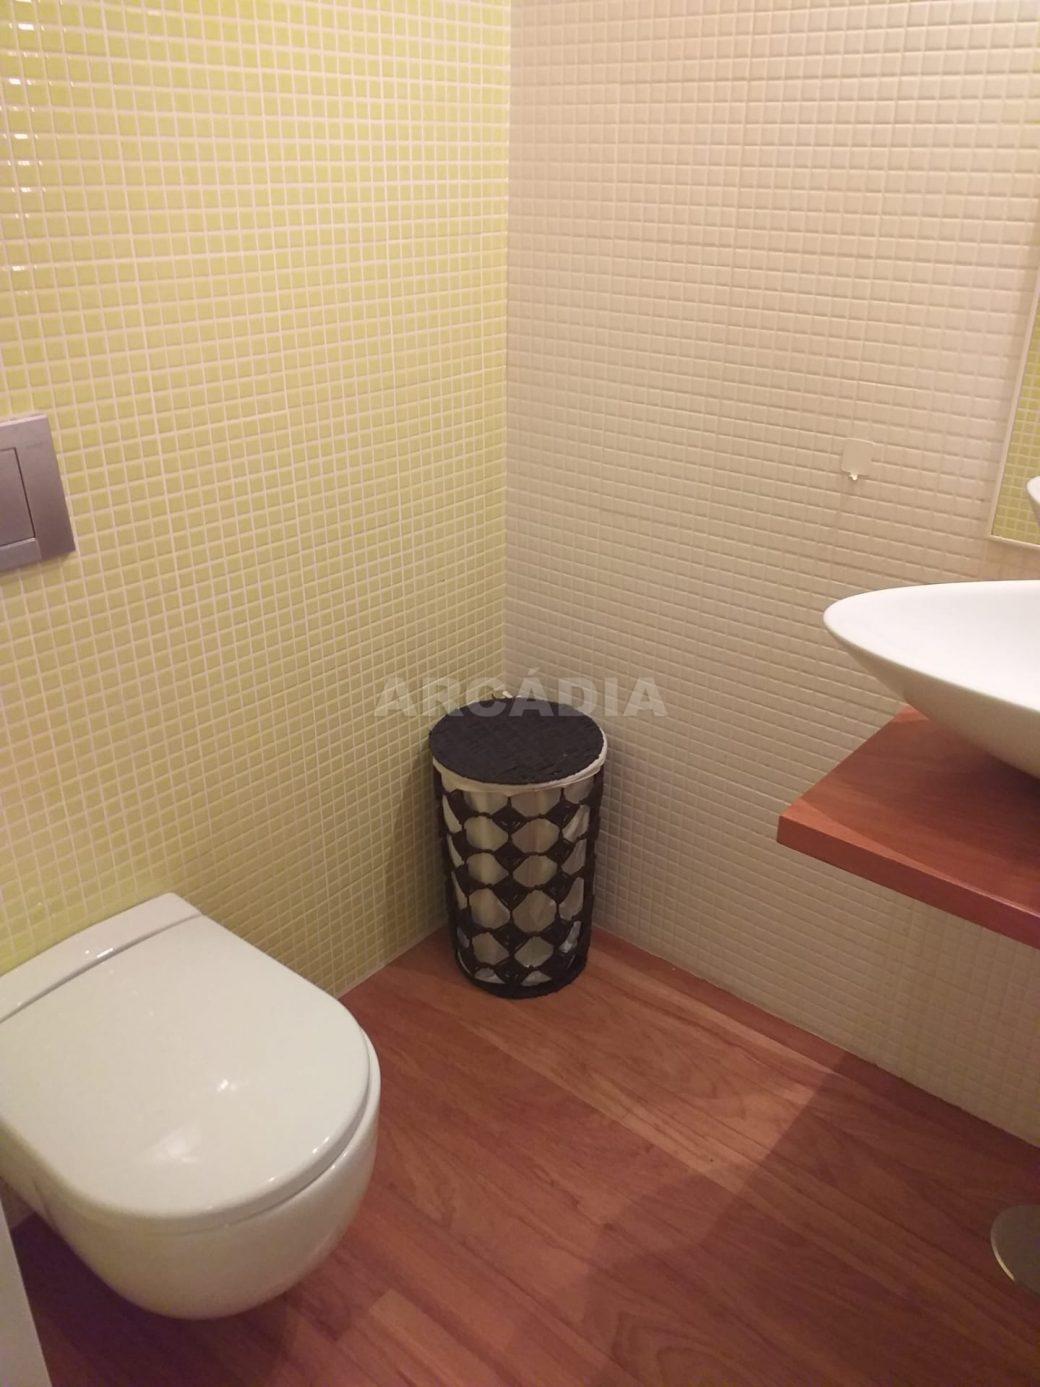 arcadia-imobiliaria-braga-apartamento-no-centro-historico-de-braga-tipo-2-para-compra-16